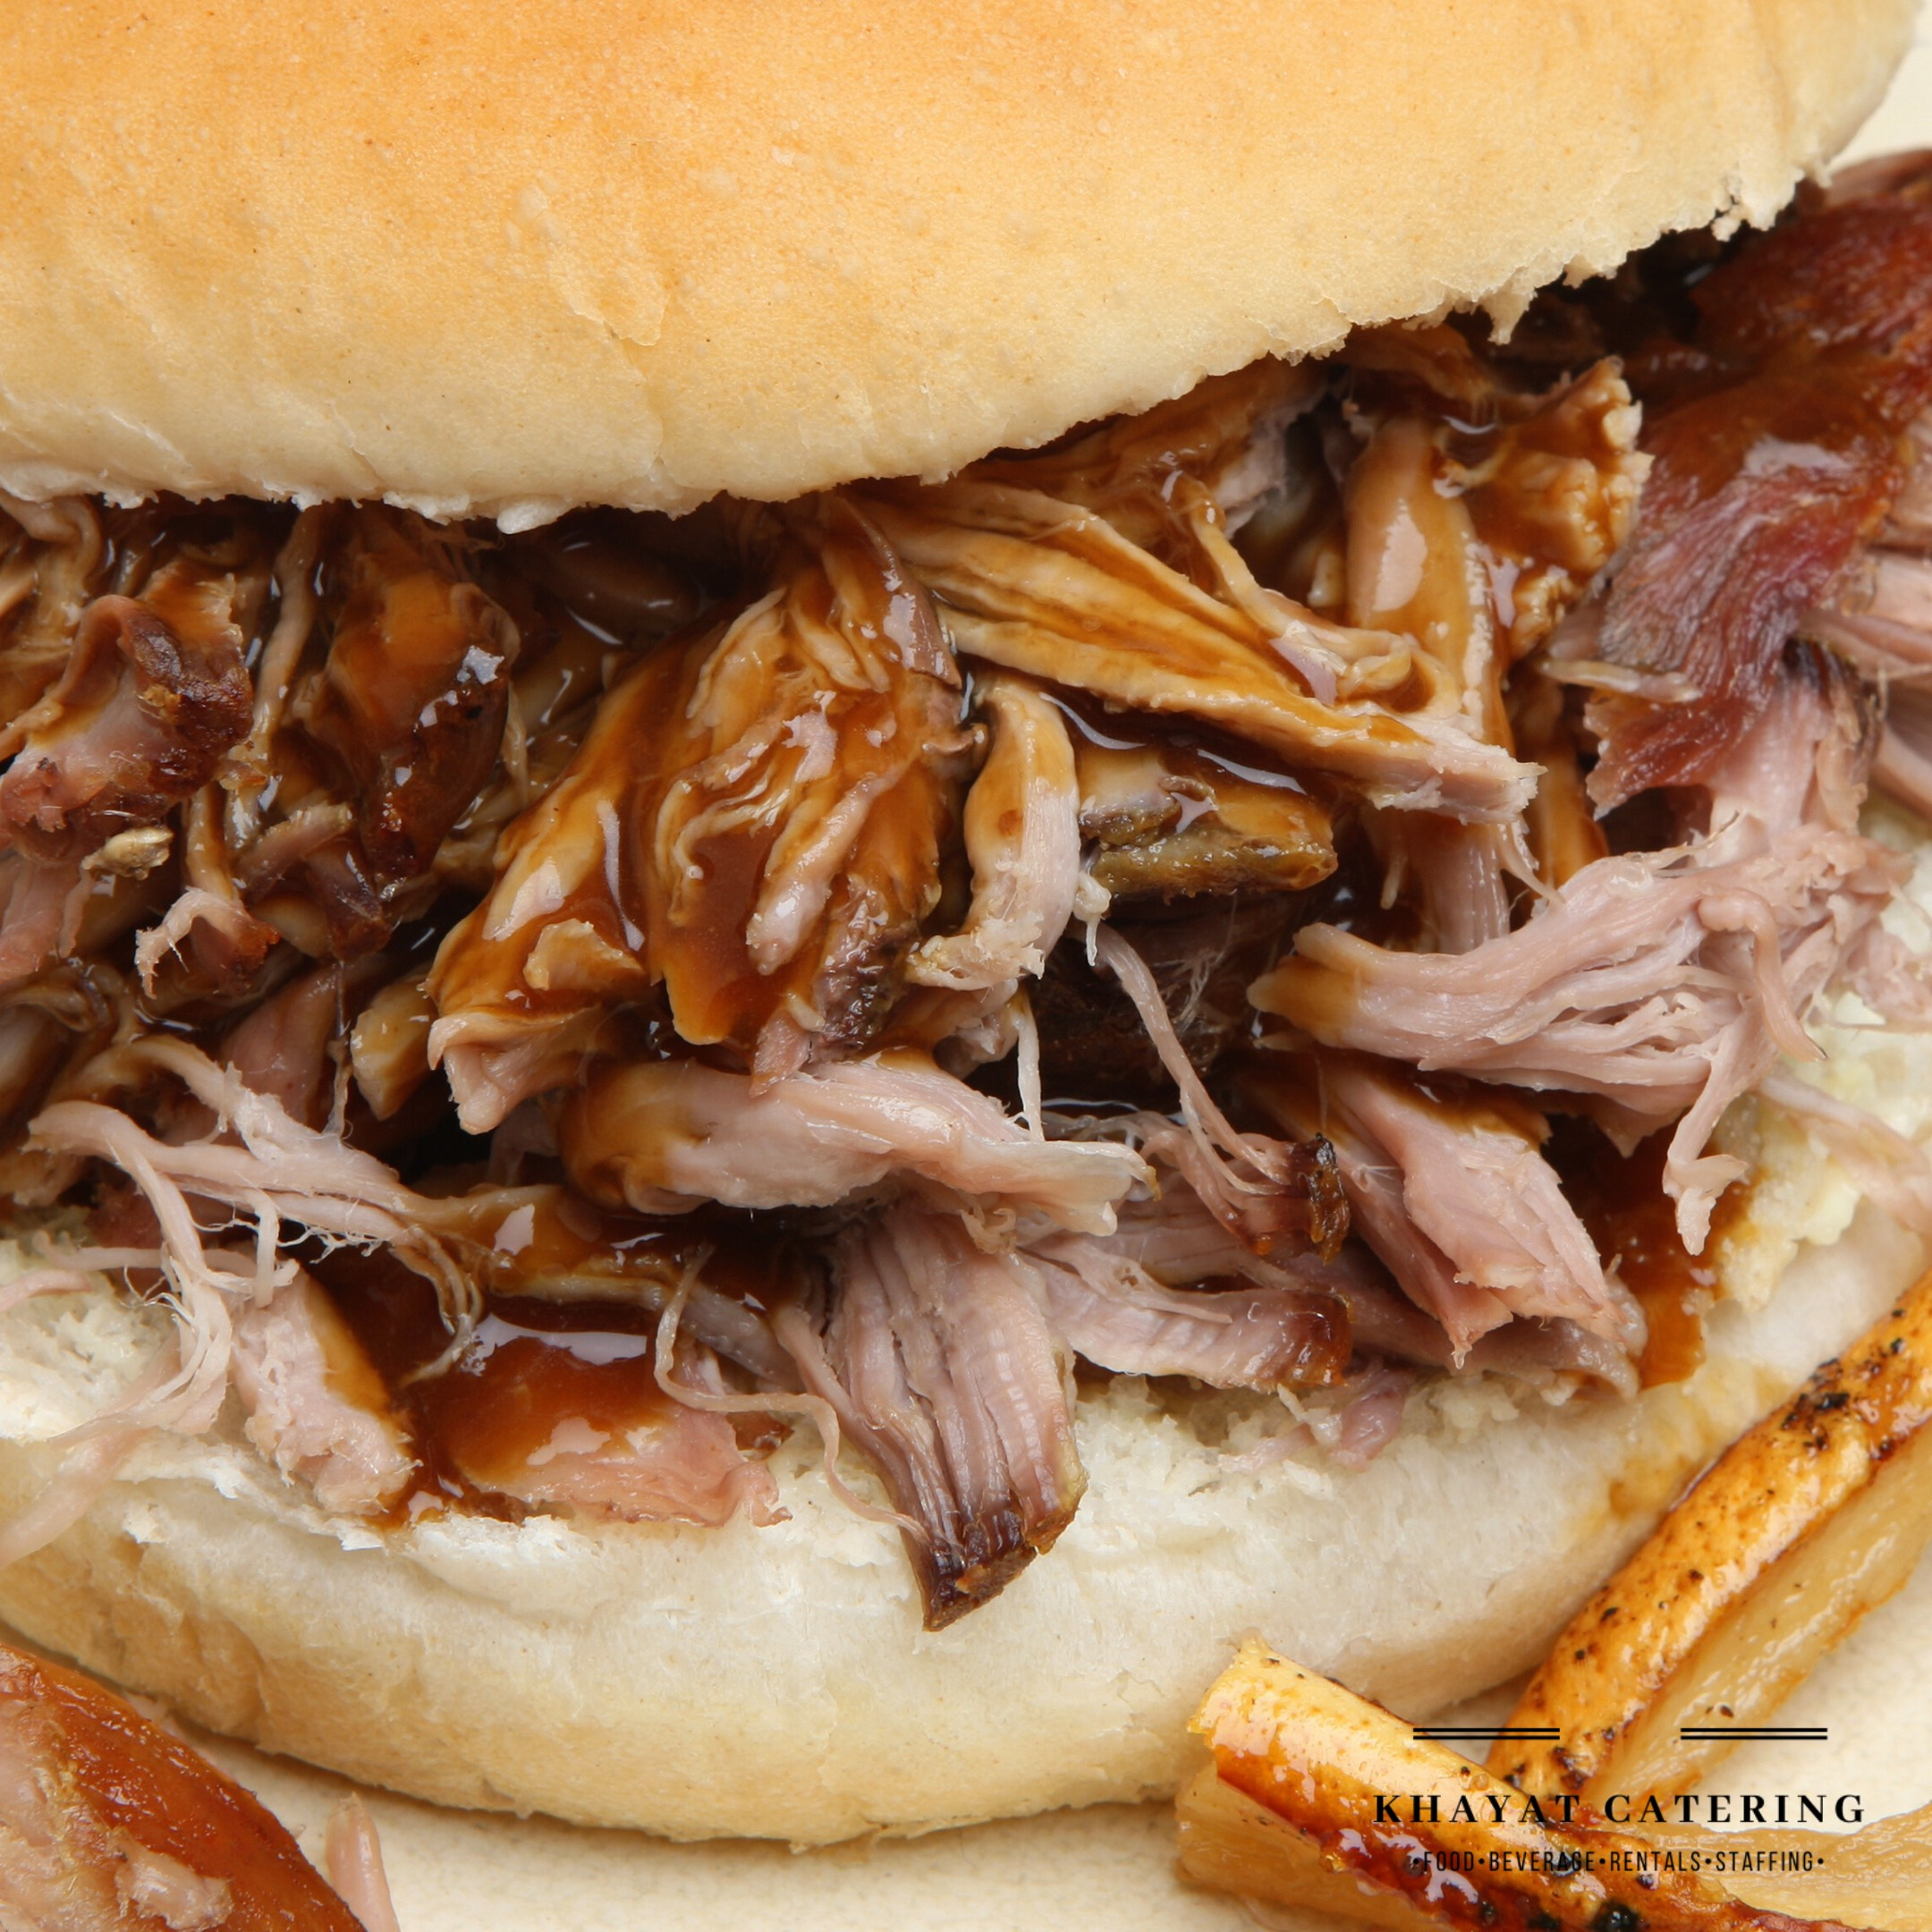 Khayat Catering pulled pork sandwich